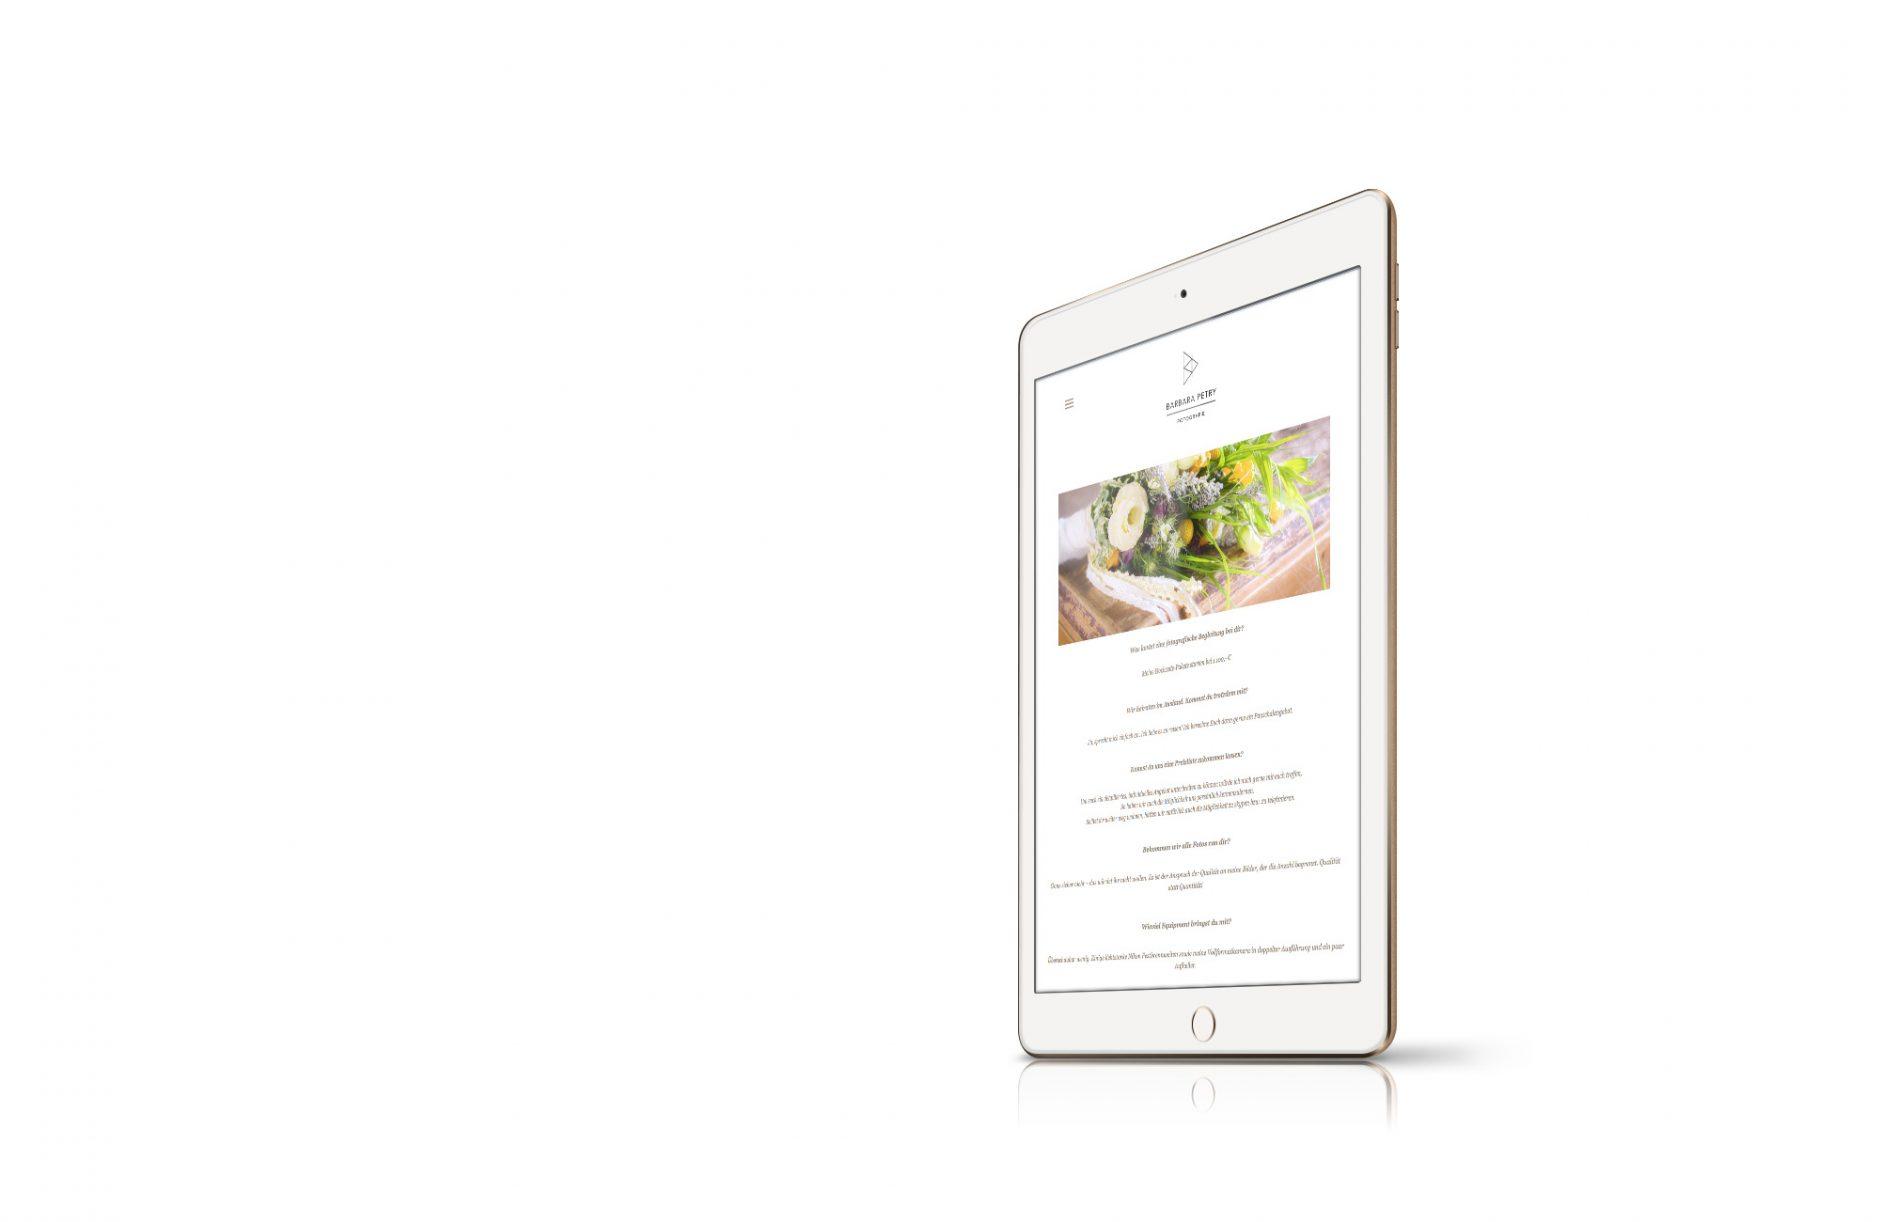 referenz_barbarapetry_tablet_01-001